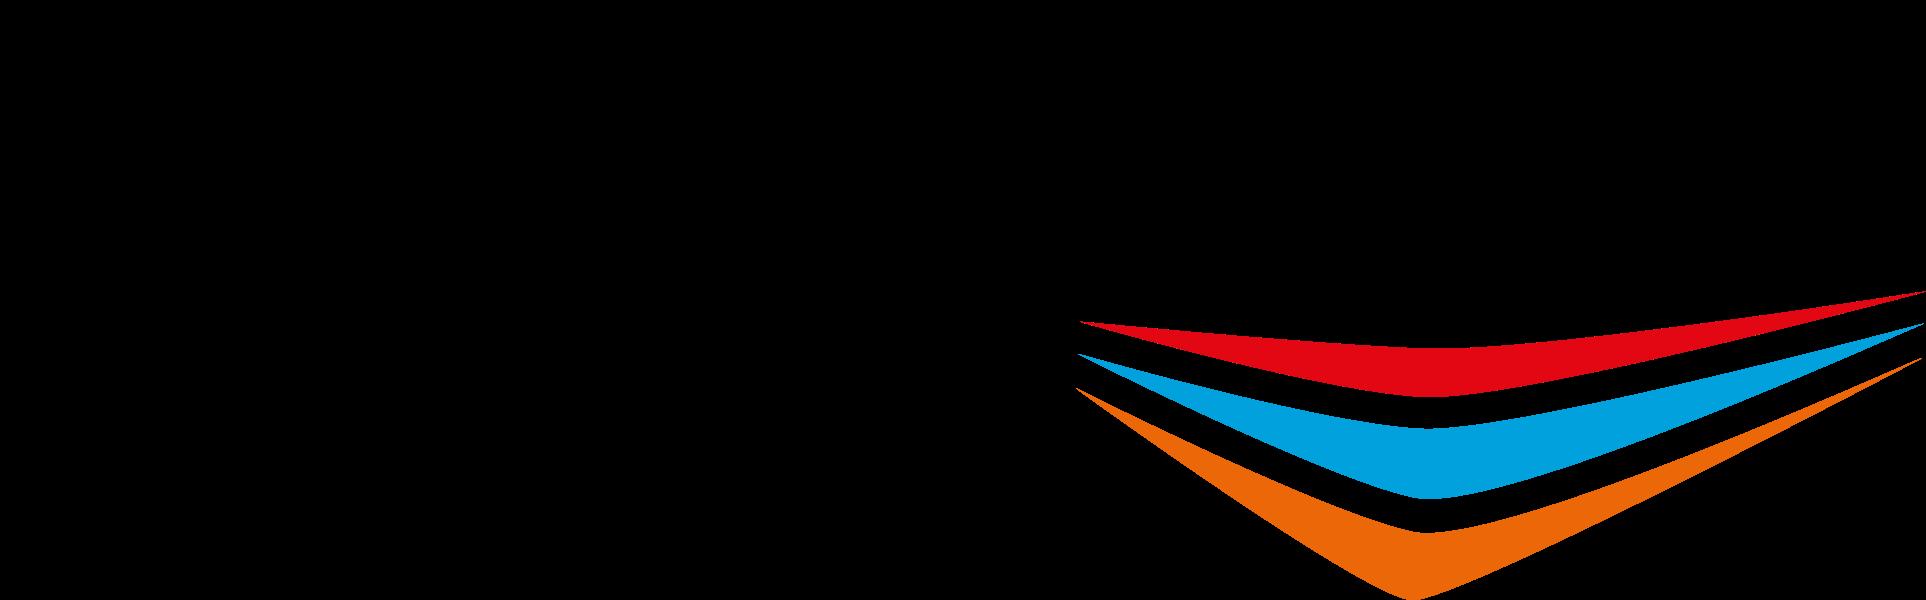 Poly-Shape logo